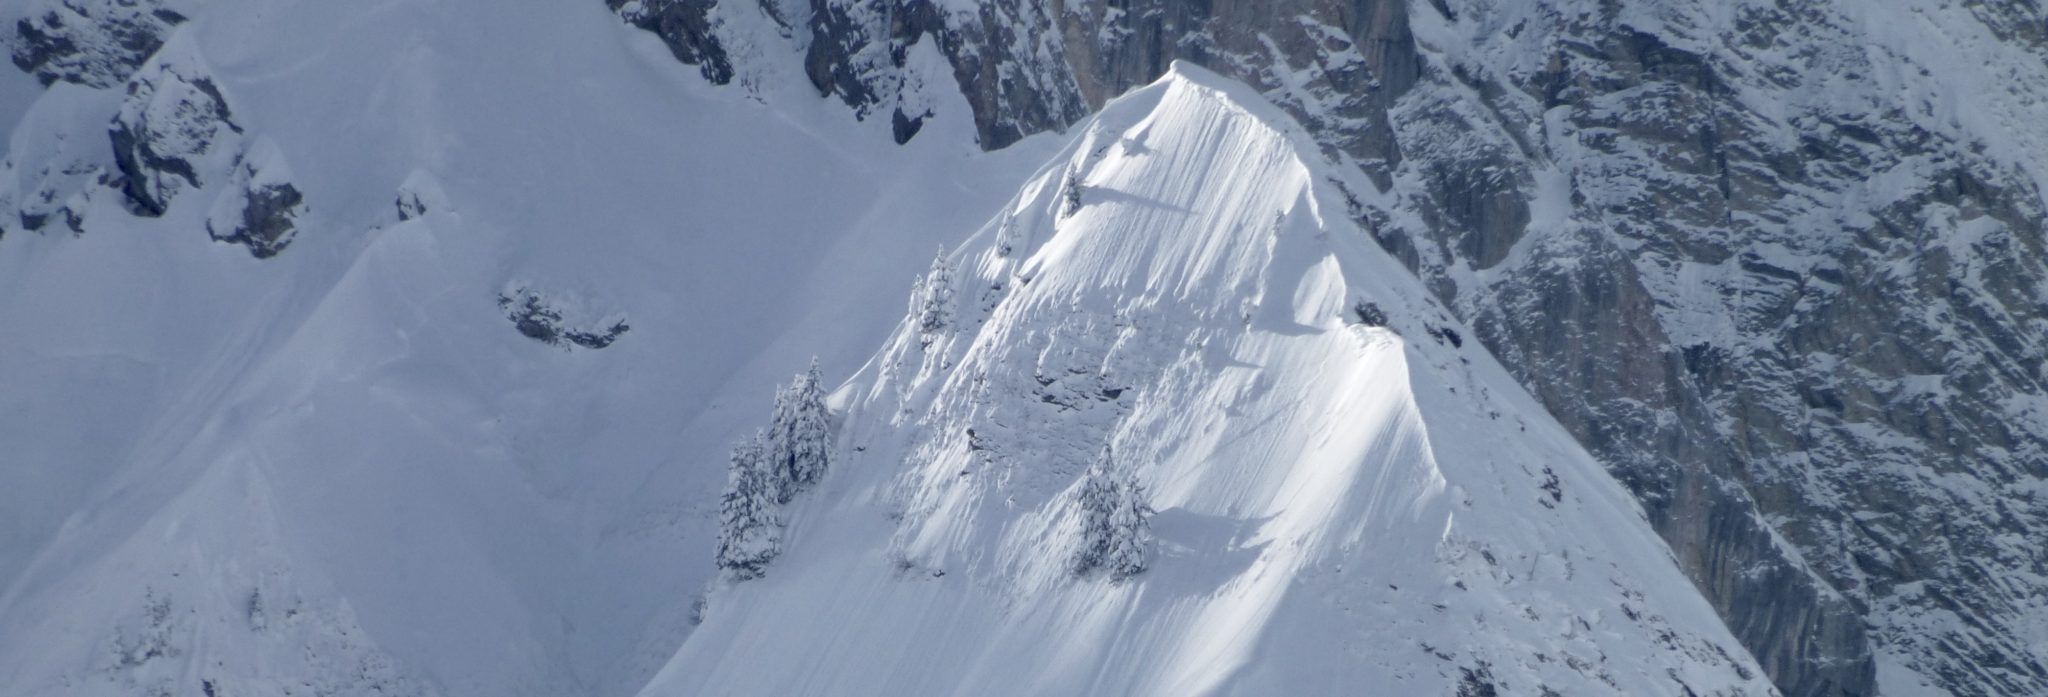 Photos des sommets alpins 11